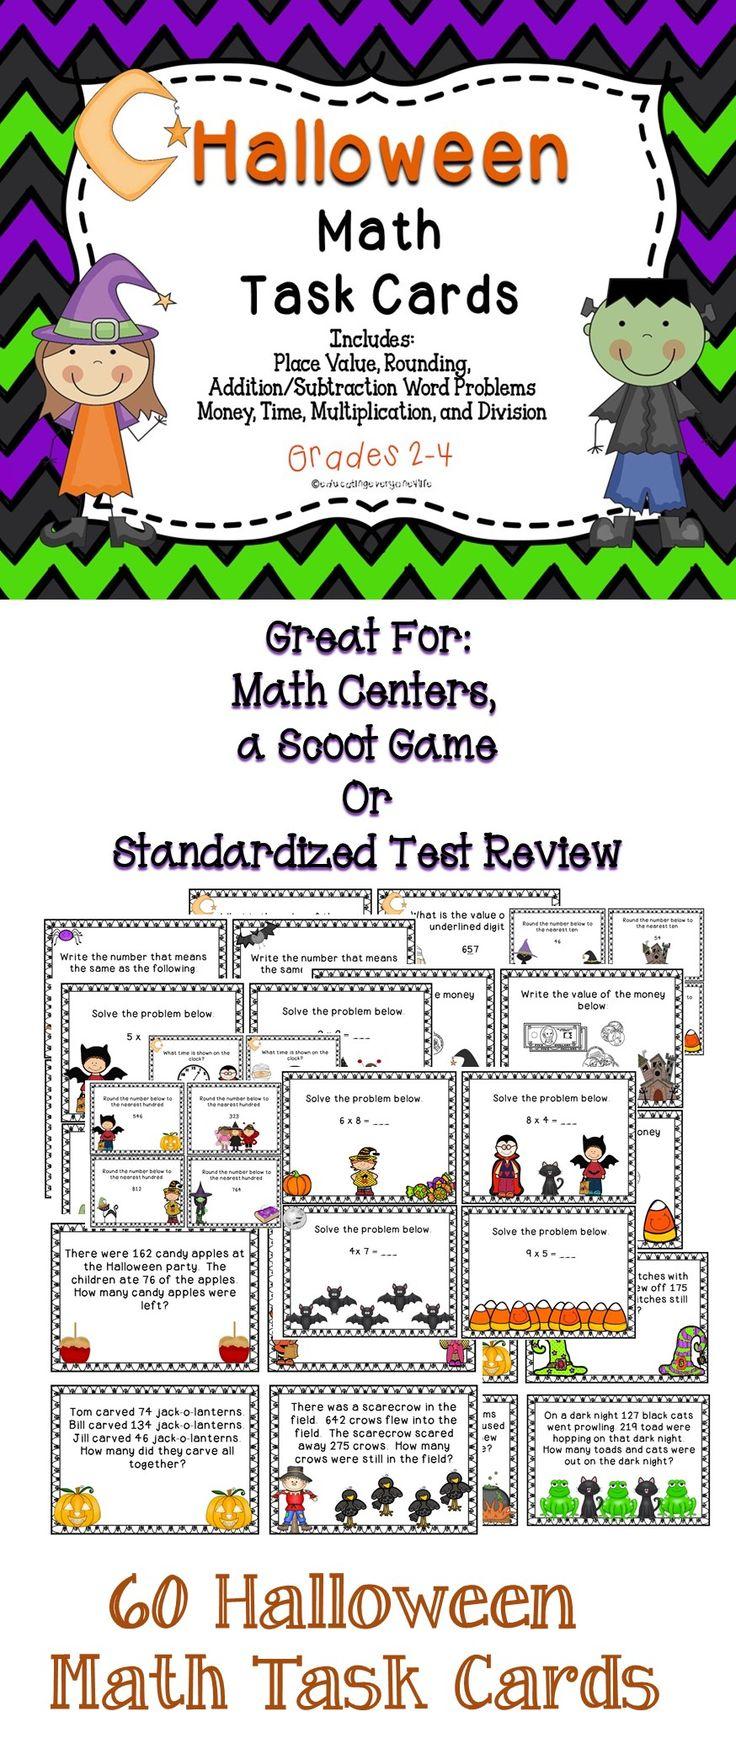 Halloween Math Task Cards - A great set of math task cards to use during October. #tpt #math #task cards